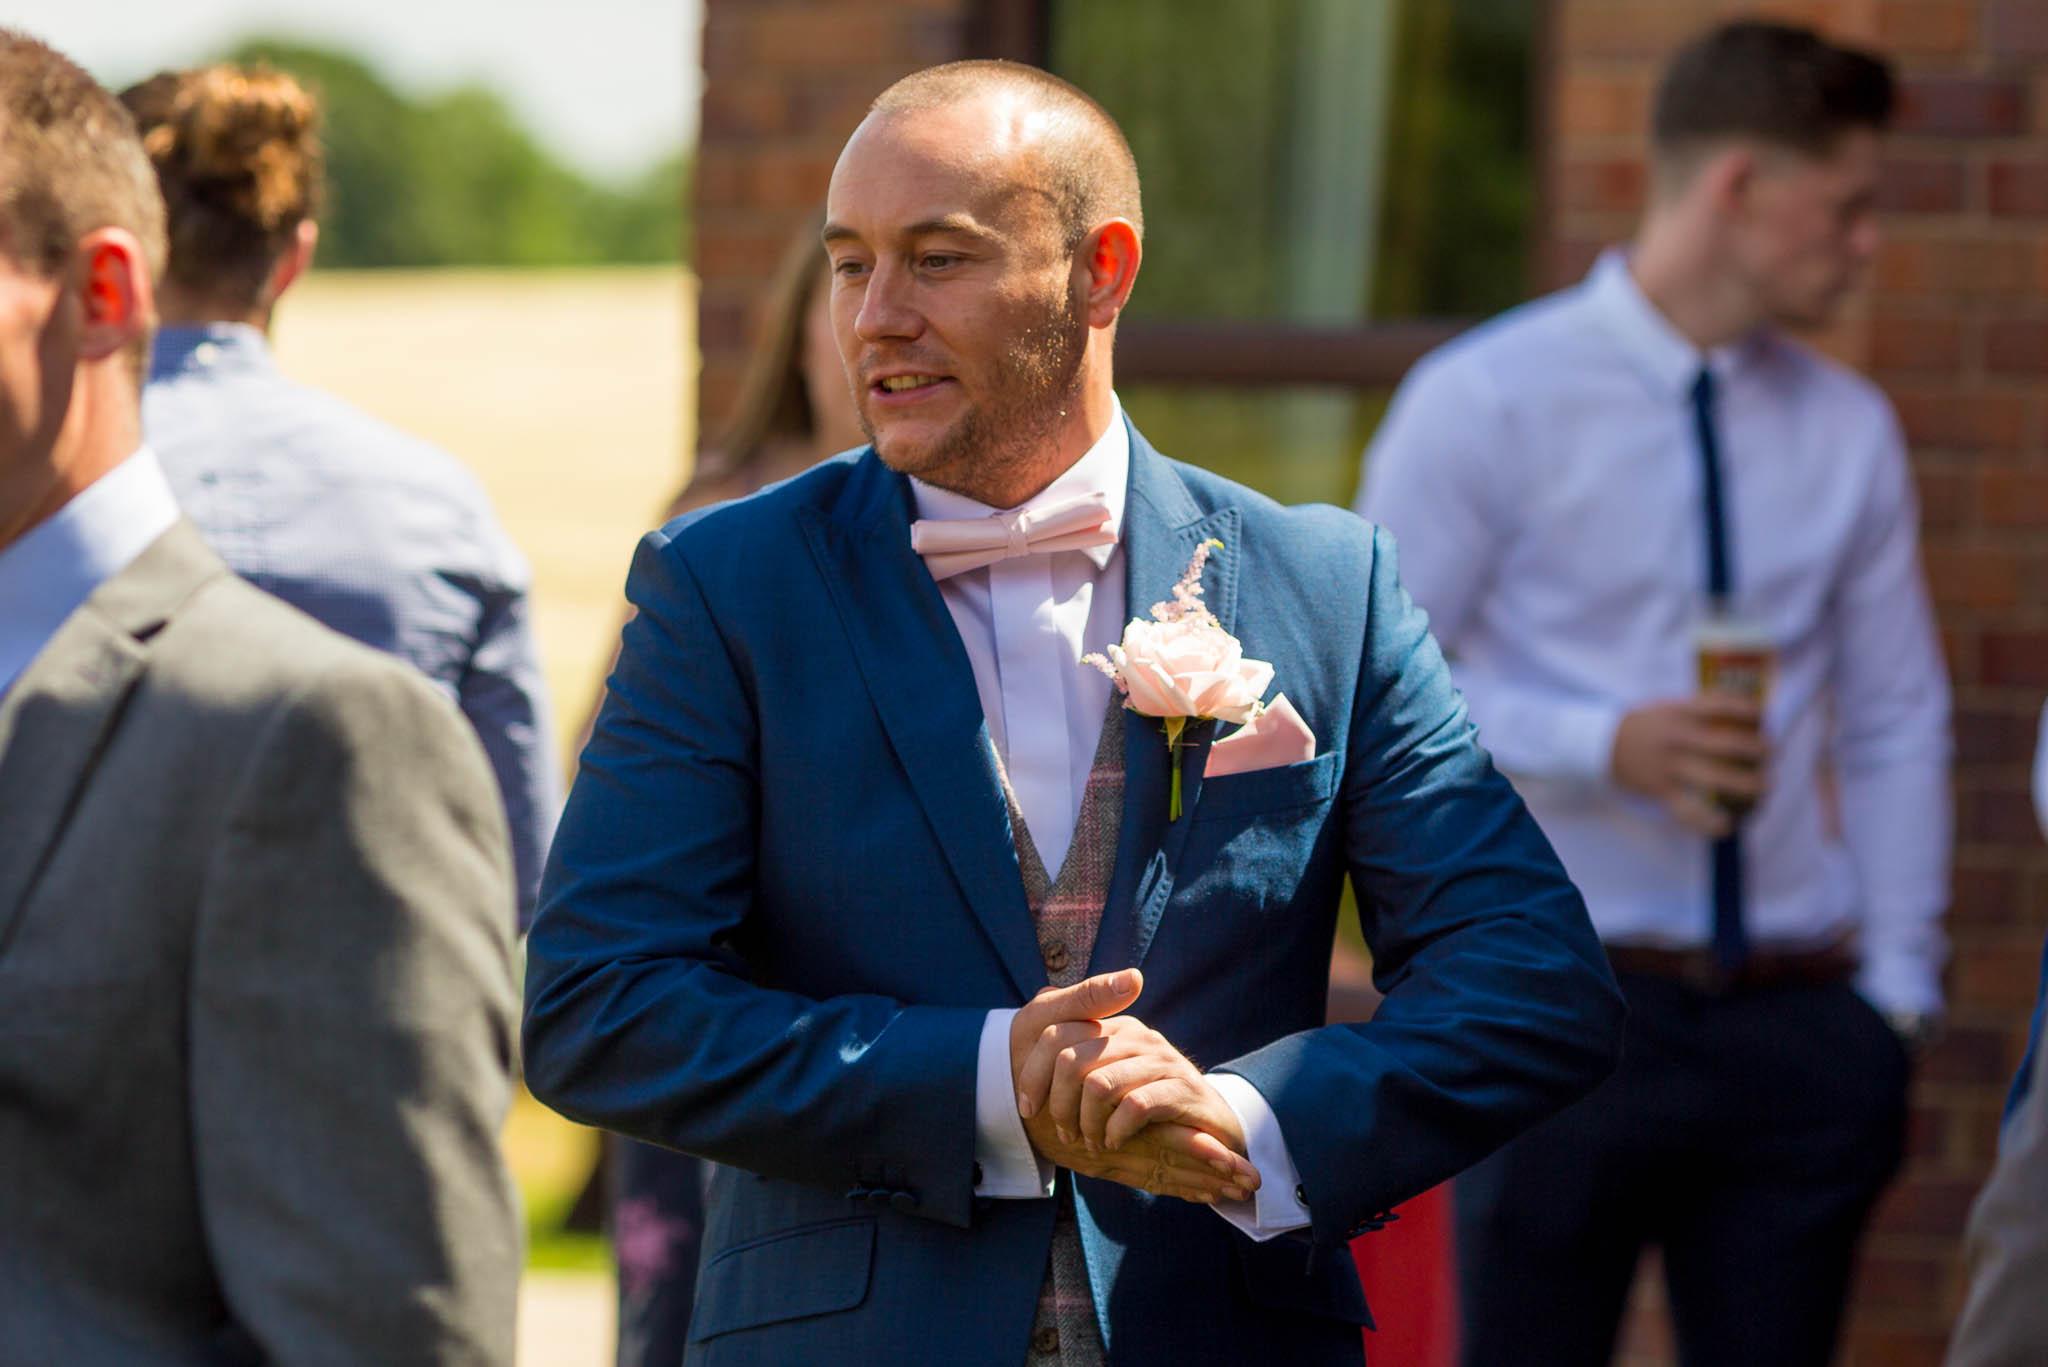 Darrington Golf Club Wedding Photographer27.jpg